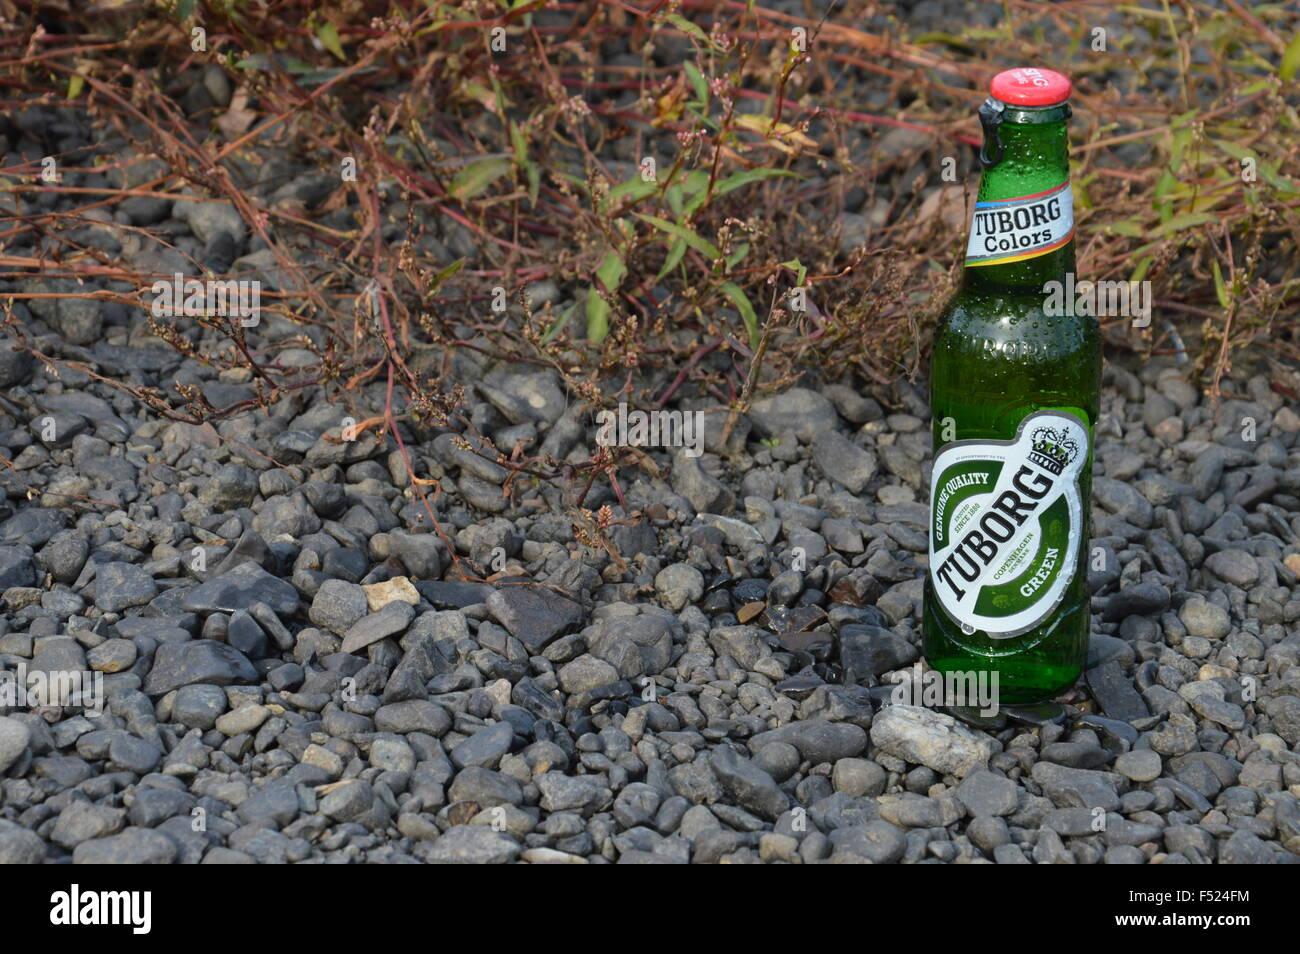 Illustrative Flasche alkoholfreies Bier Tuborg in der Natur Stockbild